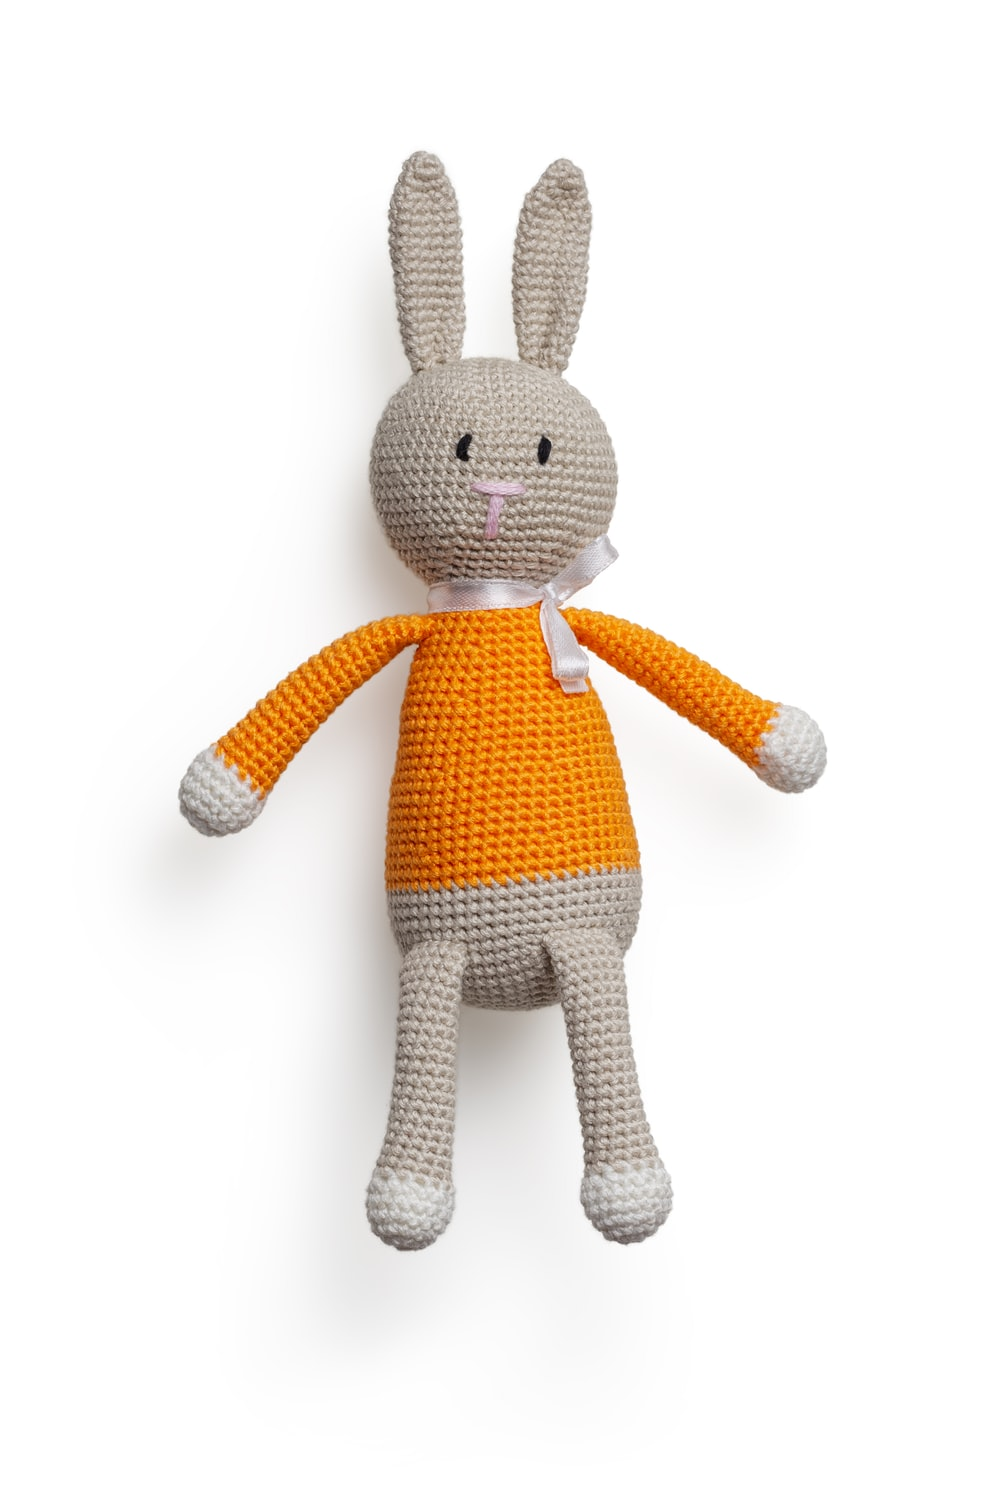 white and yellow rabbit plush toy